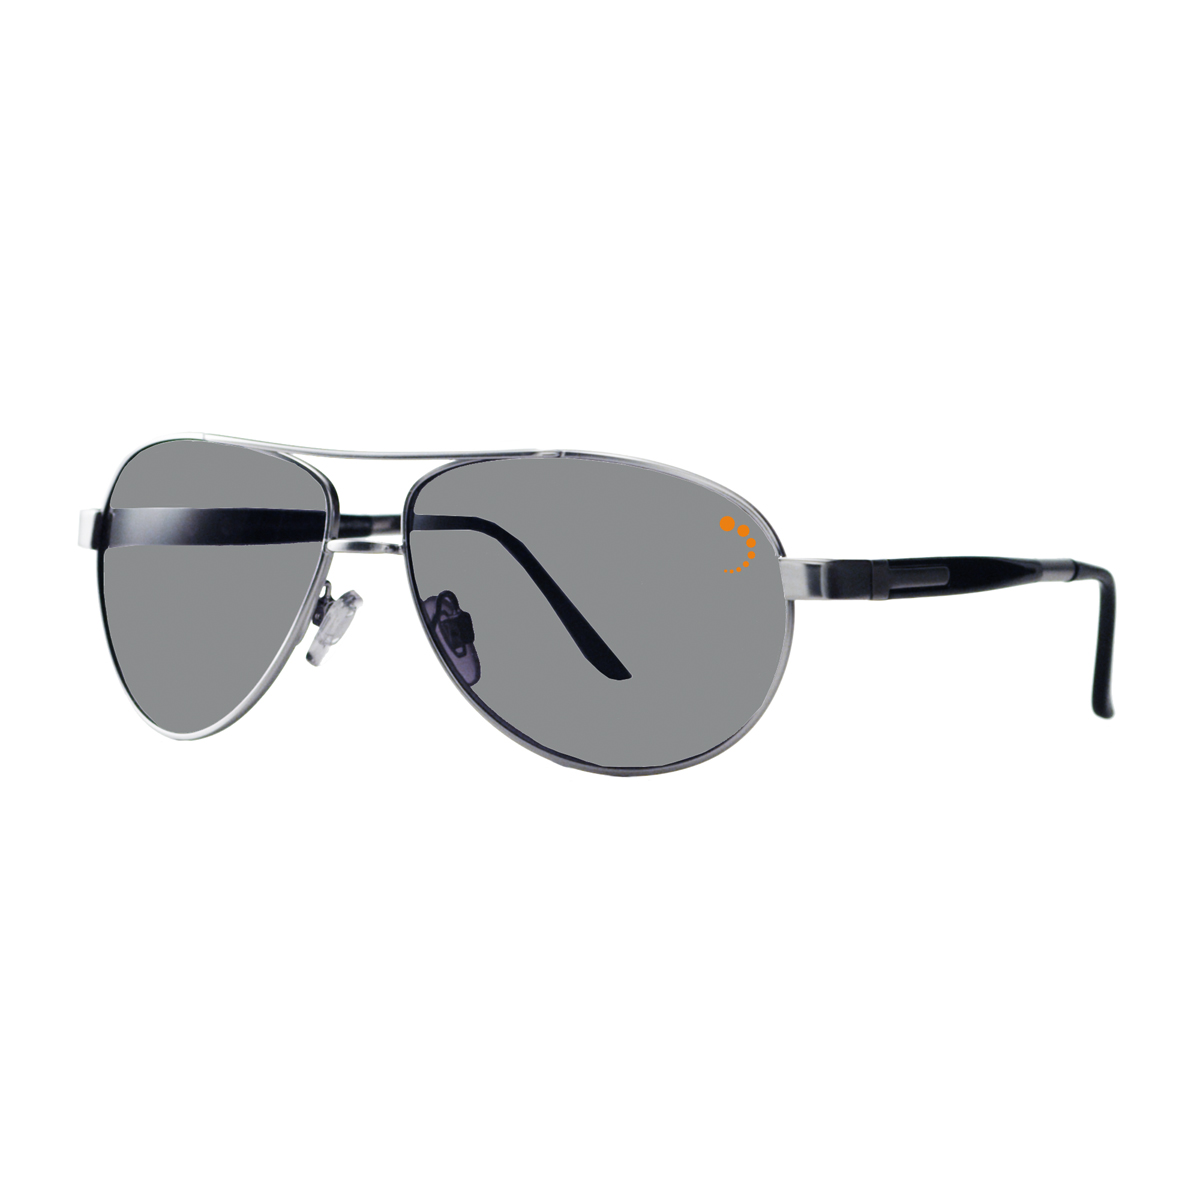 832732ffd6af JML TruColor Sunglasses Access Melanin Protection against Harmful ...